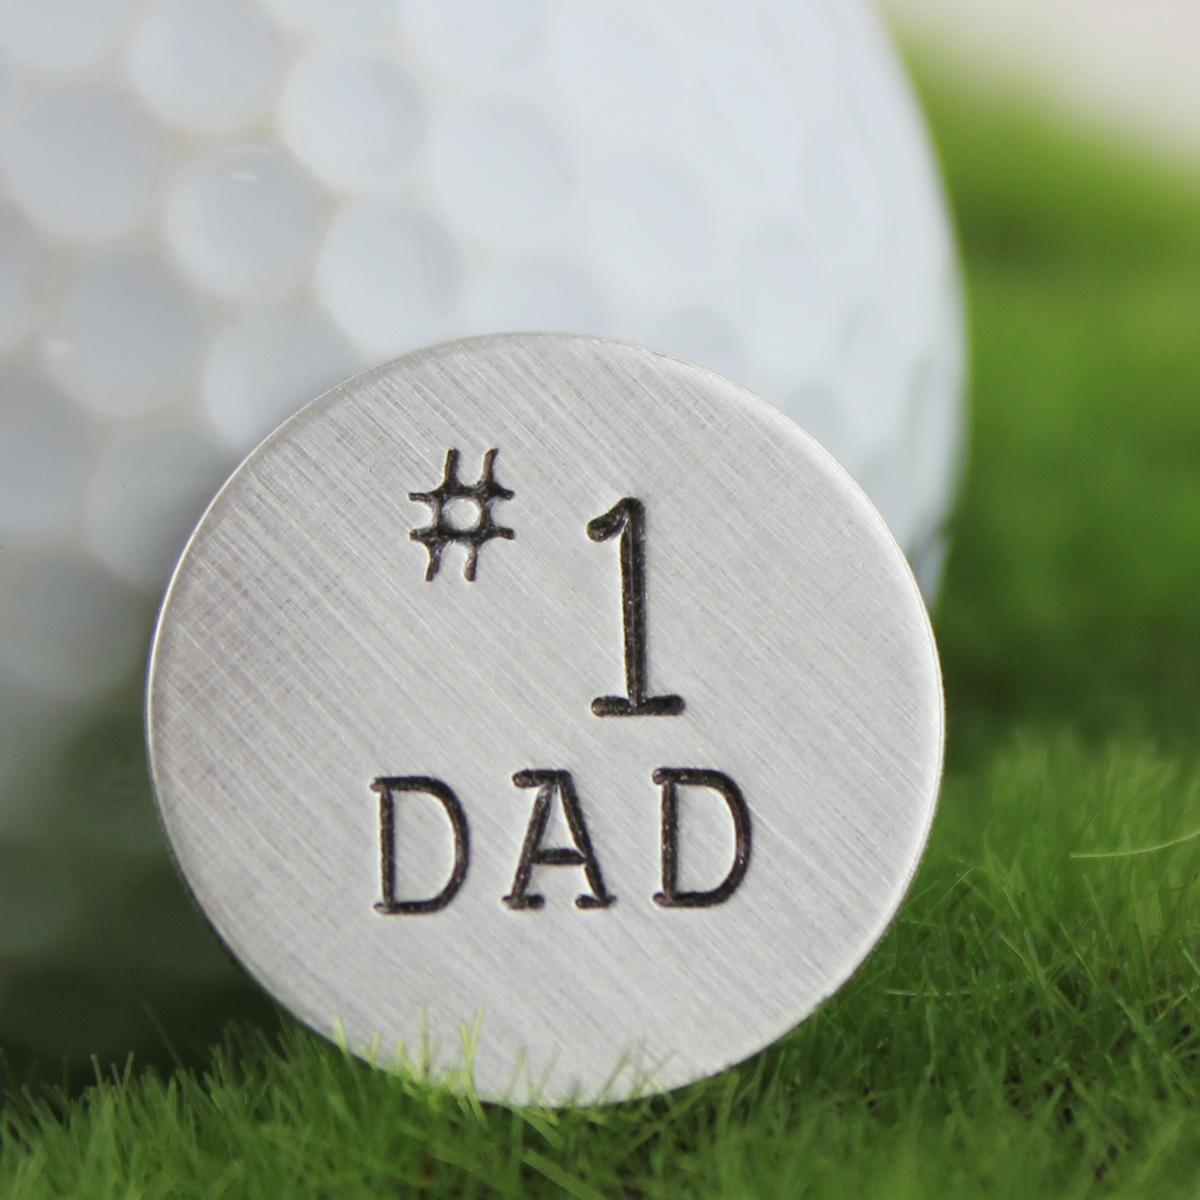 No. 1 Dad Golf Ball Marker